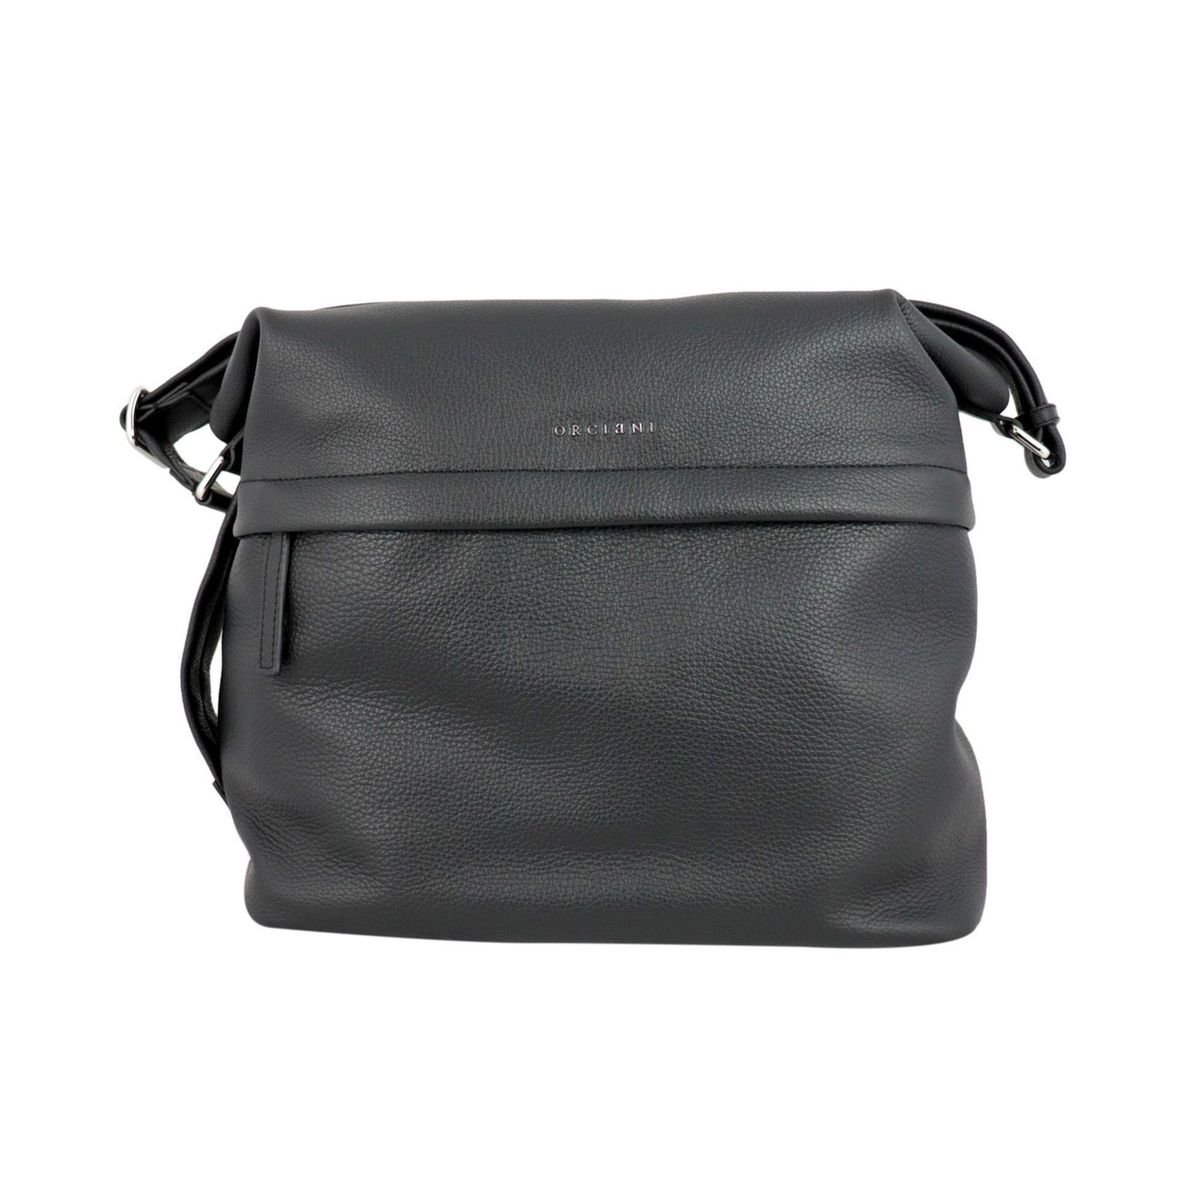 Shoulder bag in textured leather Black Orciani